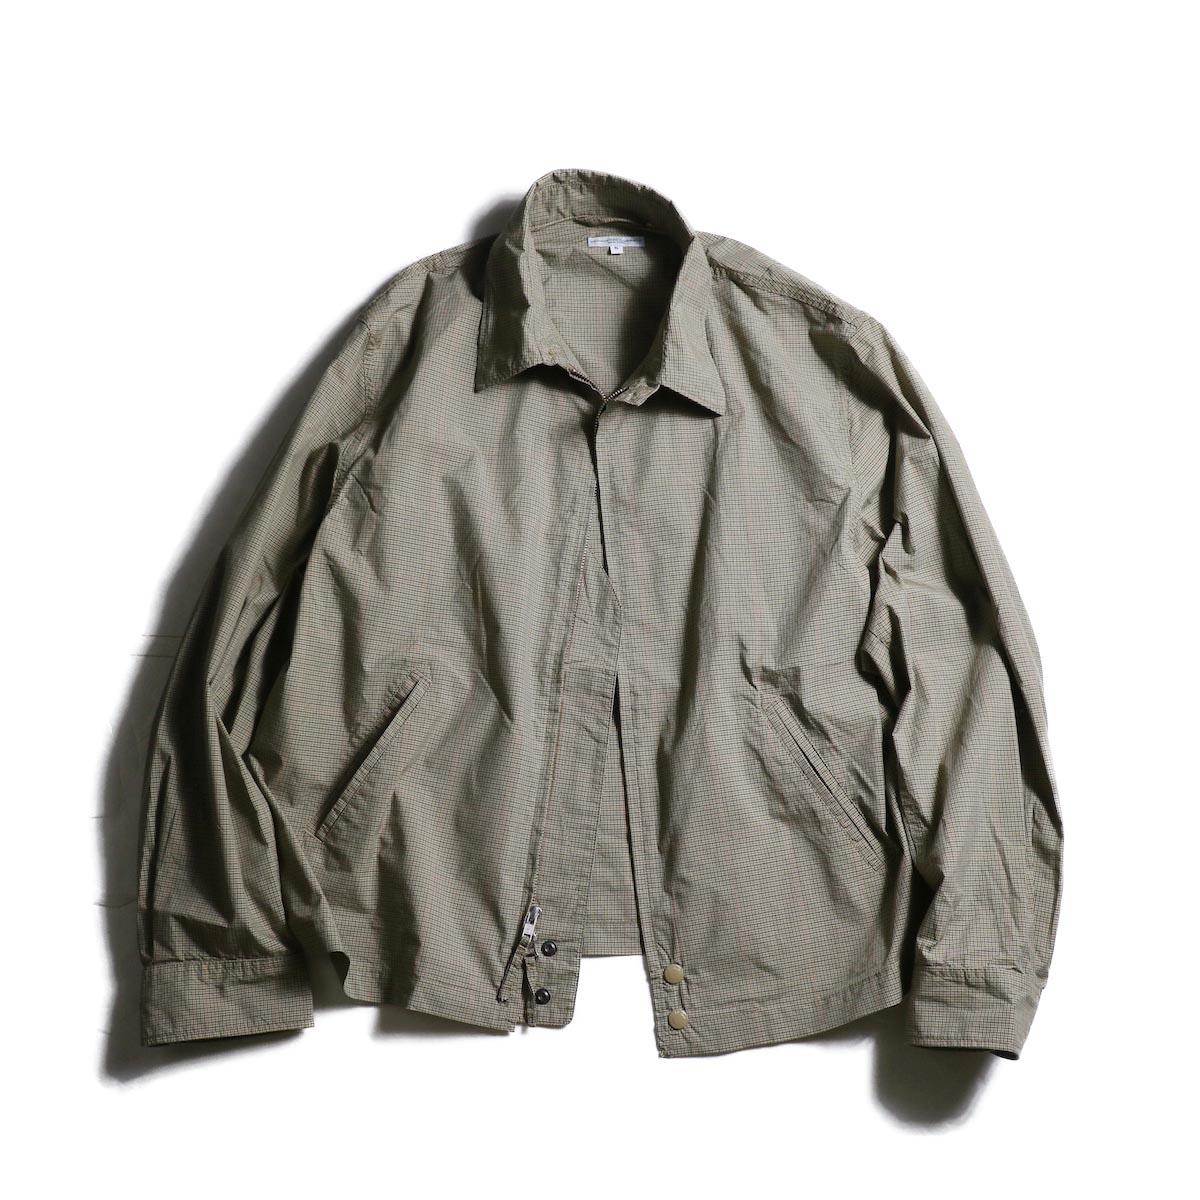 Engineered Garments / Claigton Jacket -Tyco Mini Tattersall (Khaki)